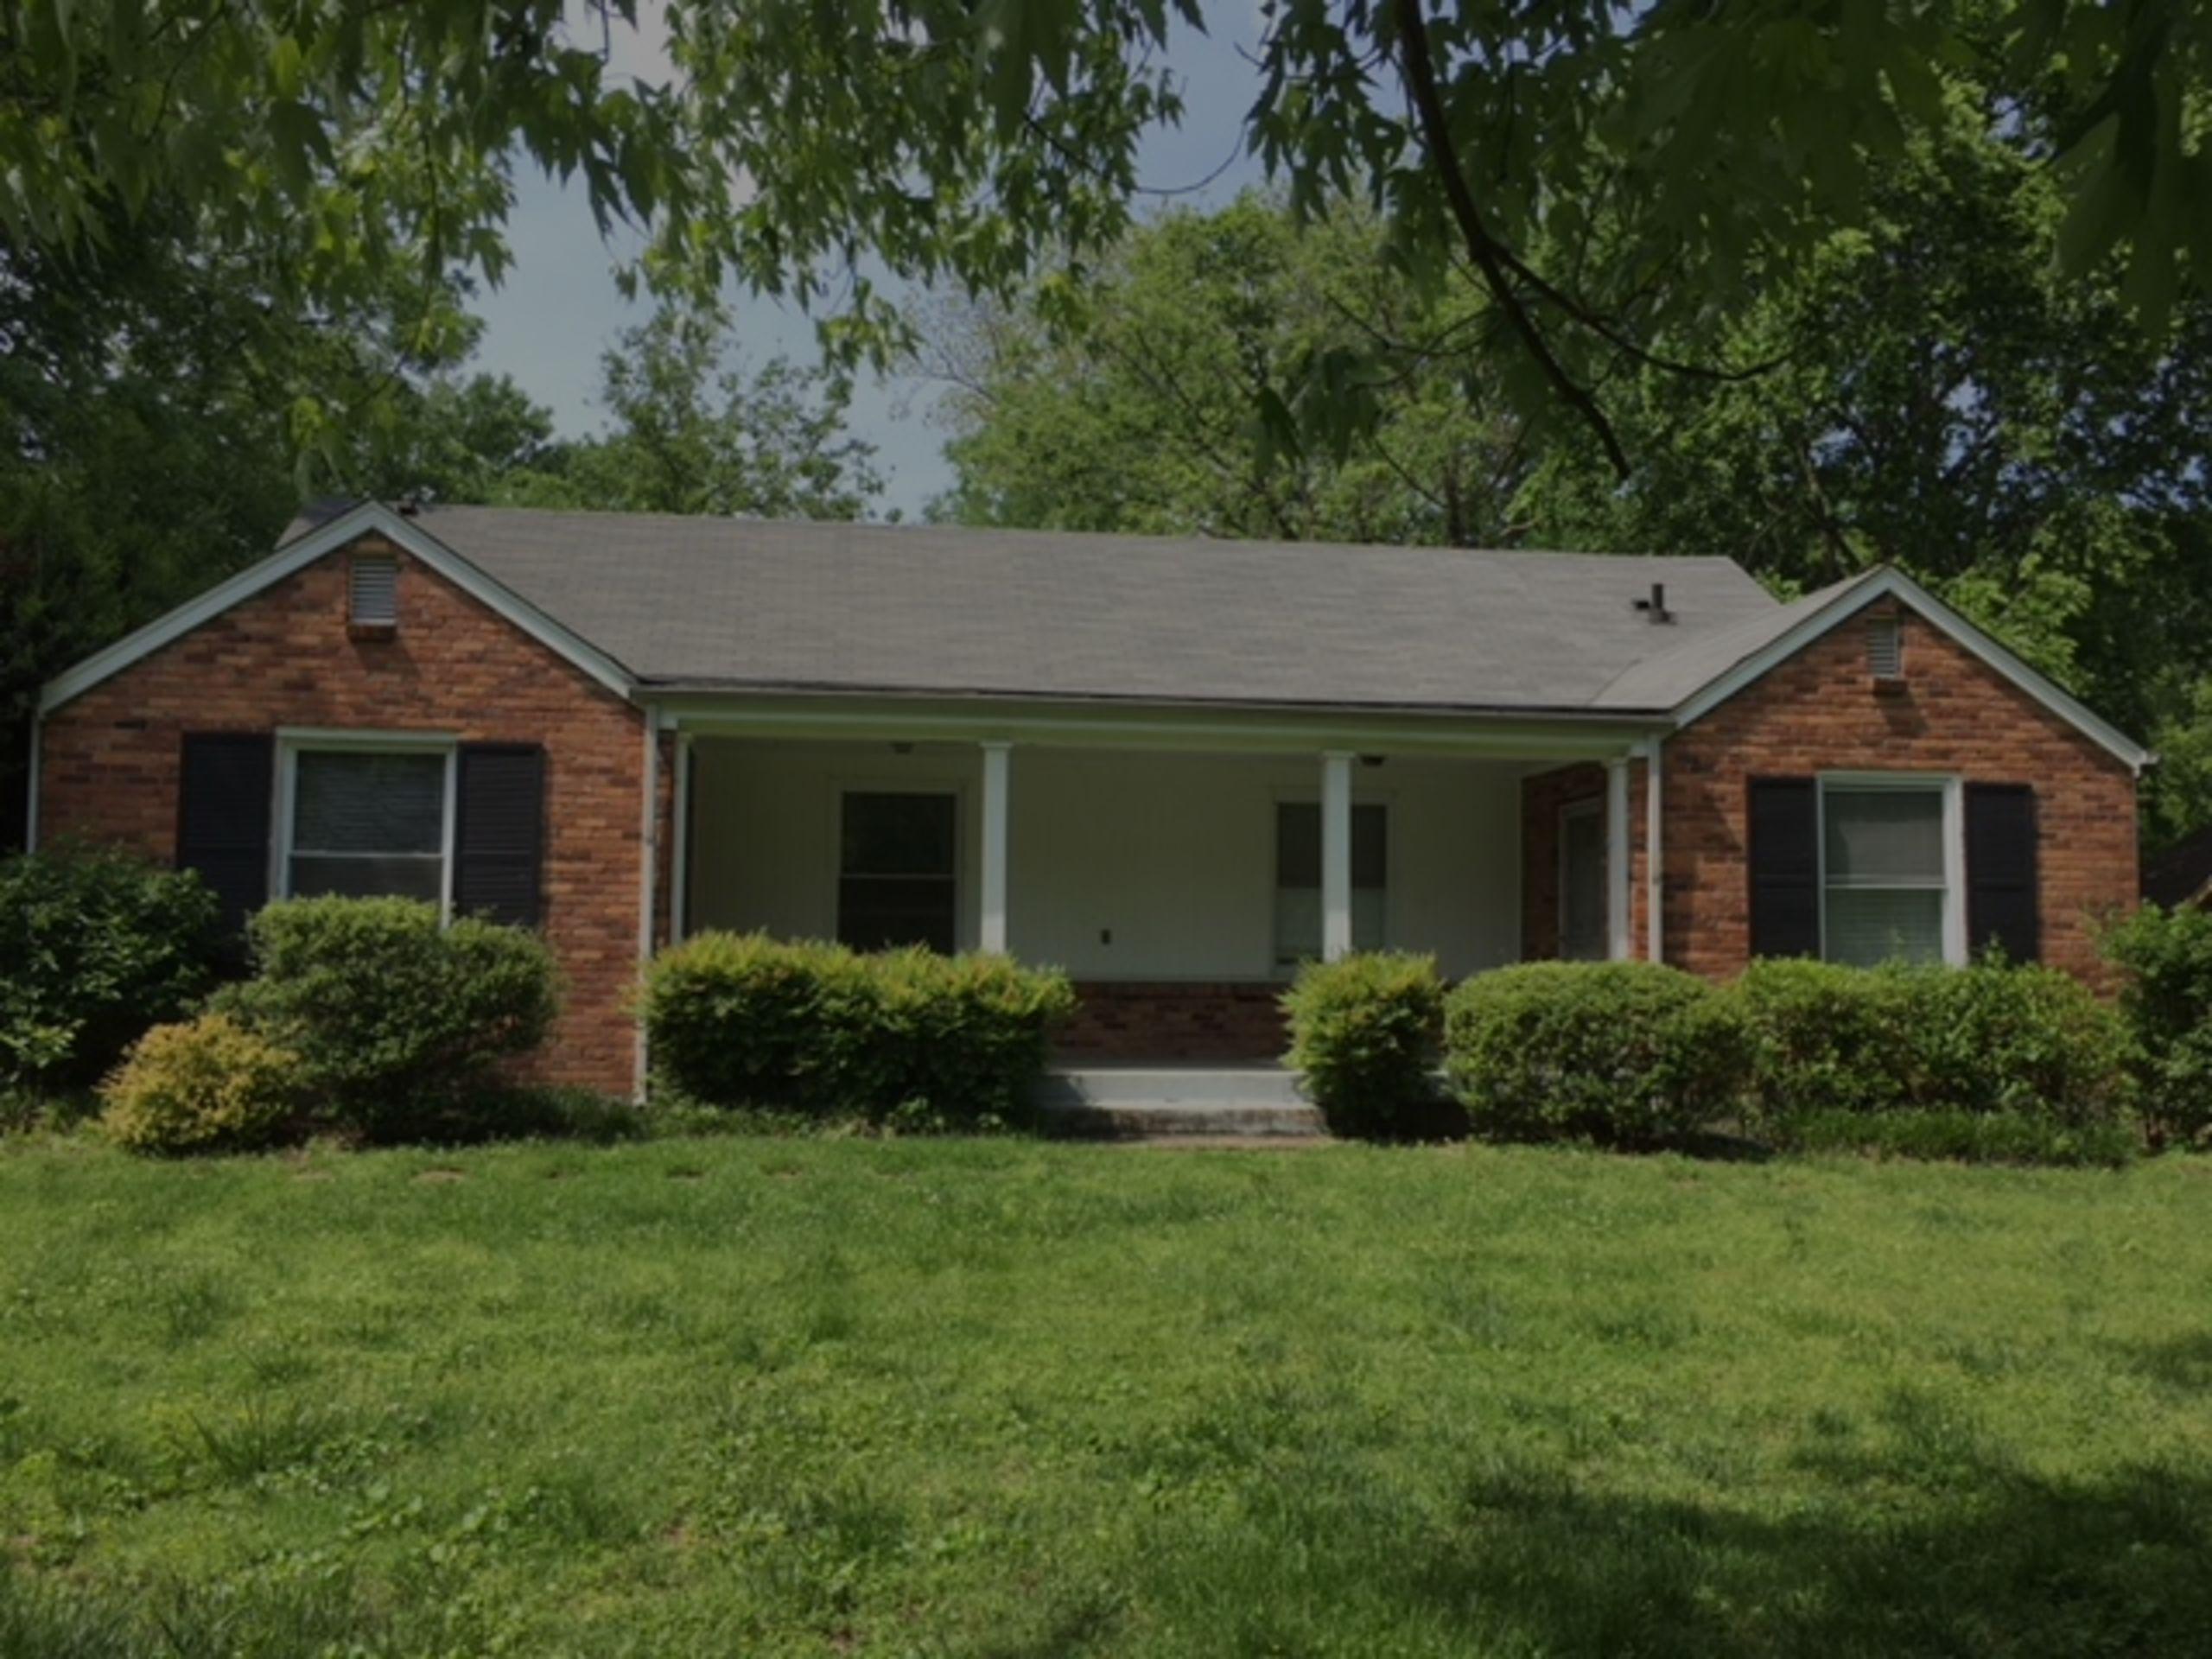 Real Estate Investing: Duplex Rental Property